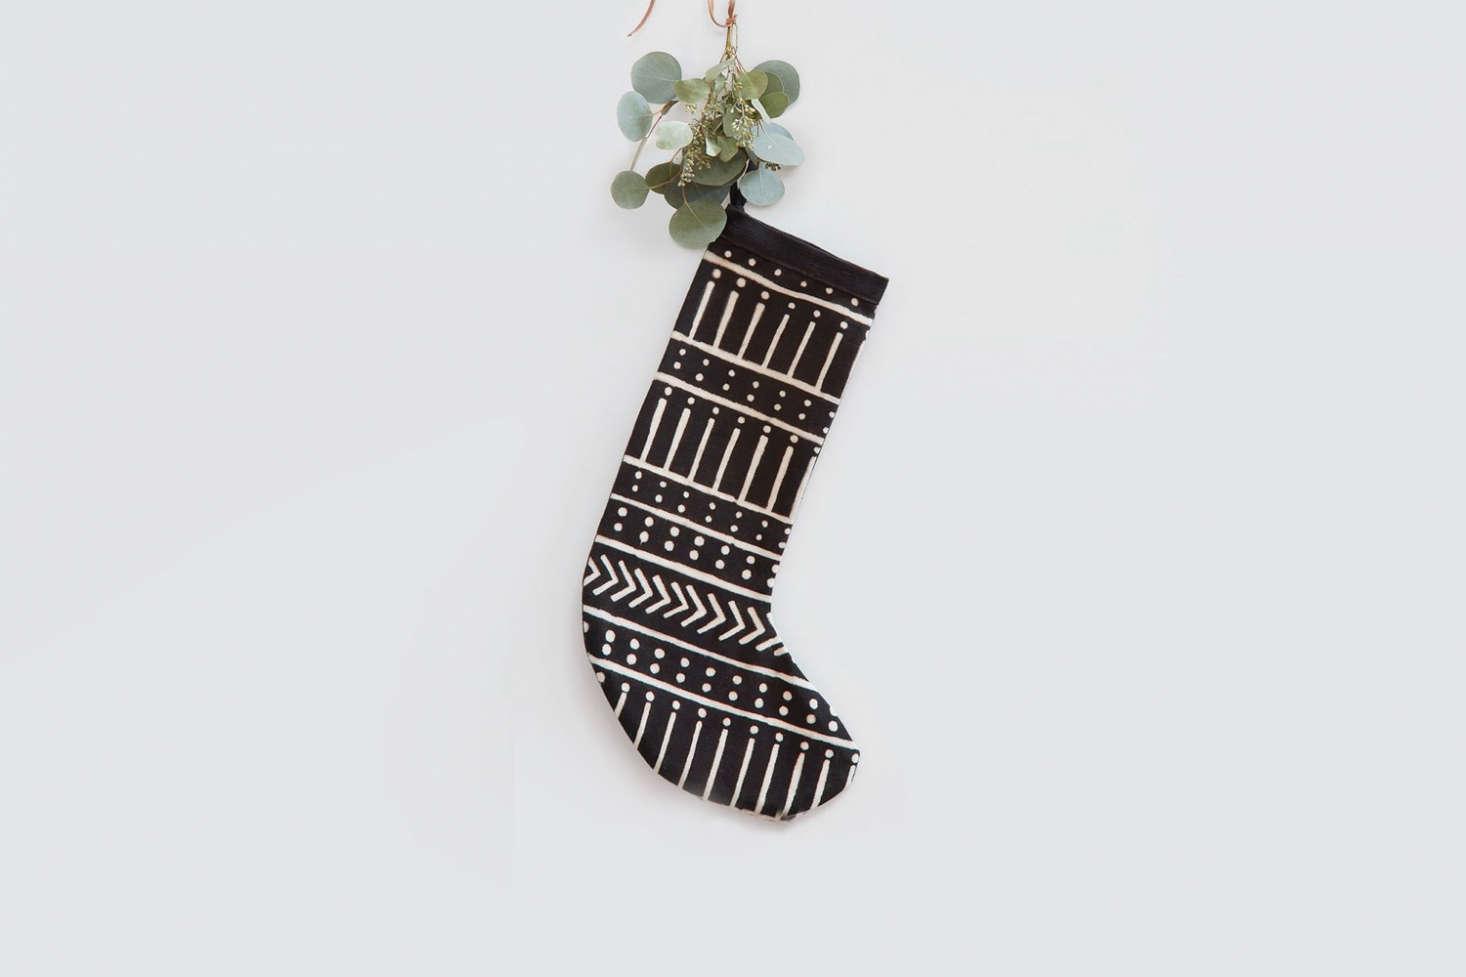 d9ca8079a5658 Etoile Mud Cloth Stocking